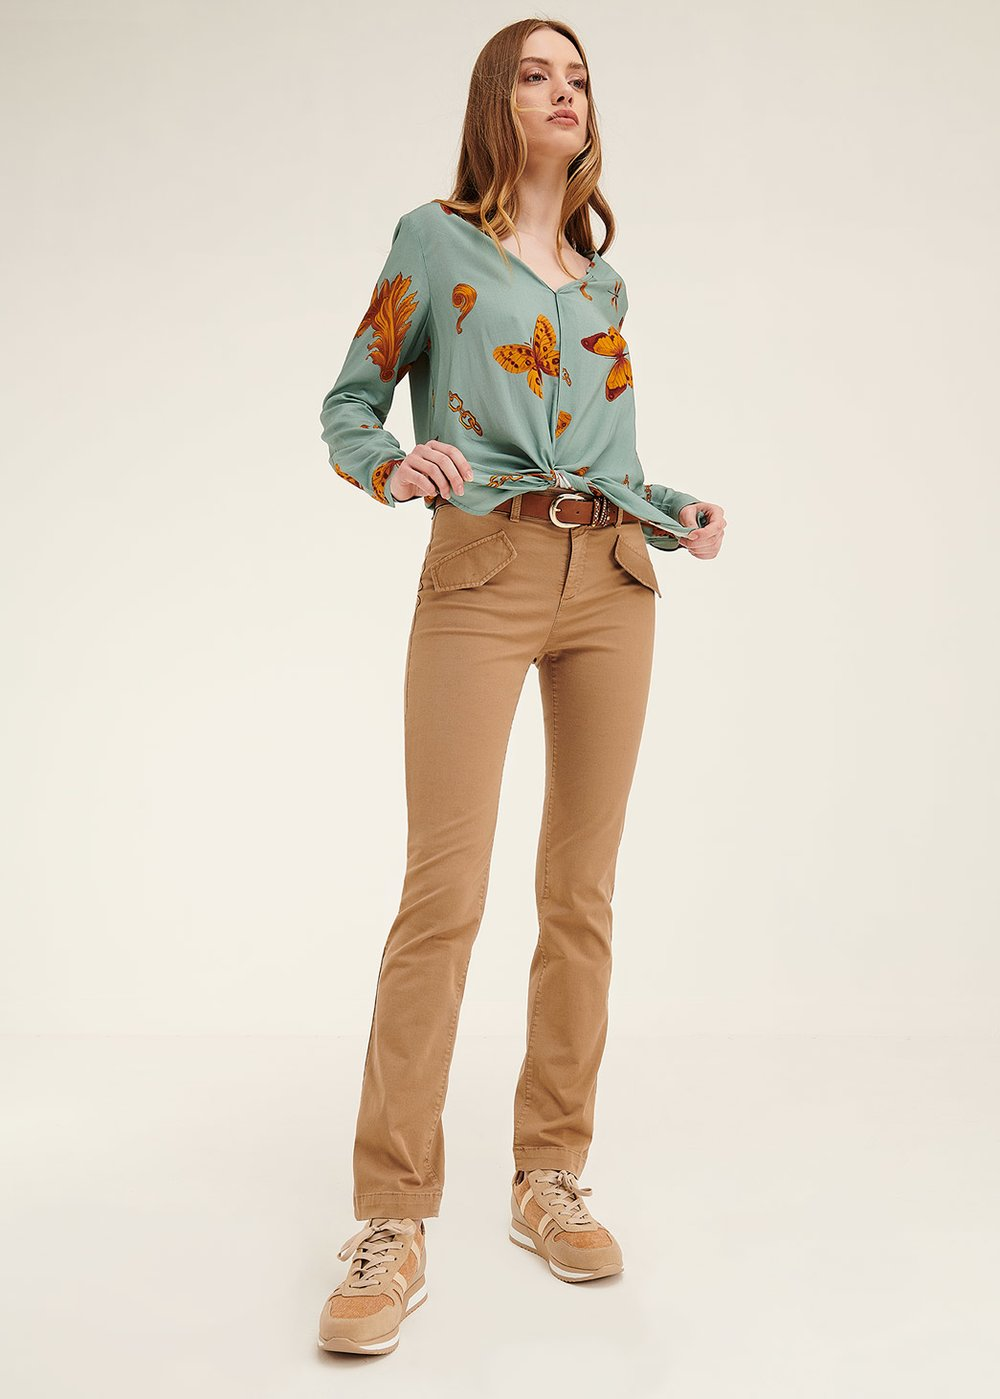 Pantalone Trekking con pattine frontali - Taupe - Donna